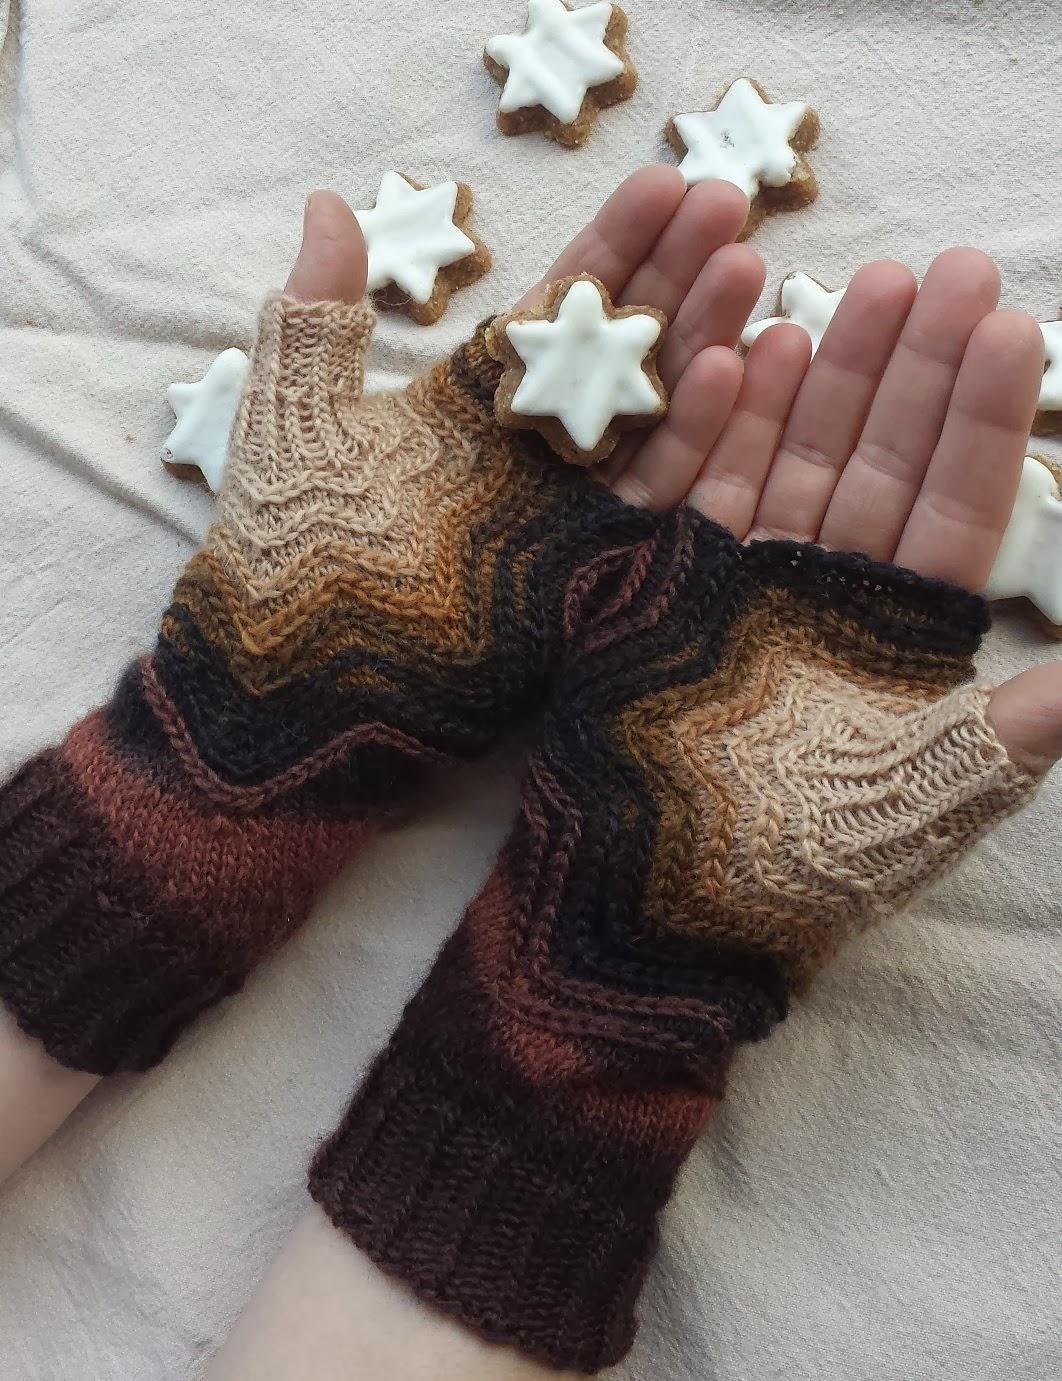 Zimtstern Cinnamon Star Fingerless Mitts Free Knitting Pattern